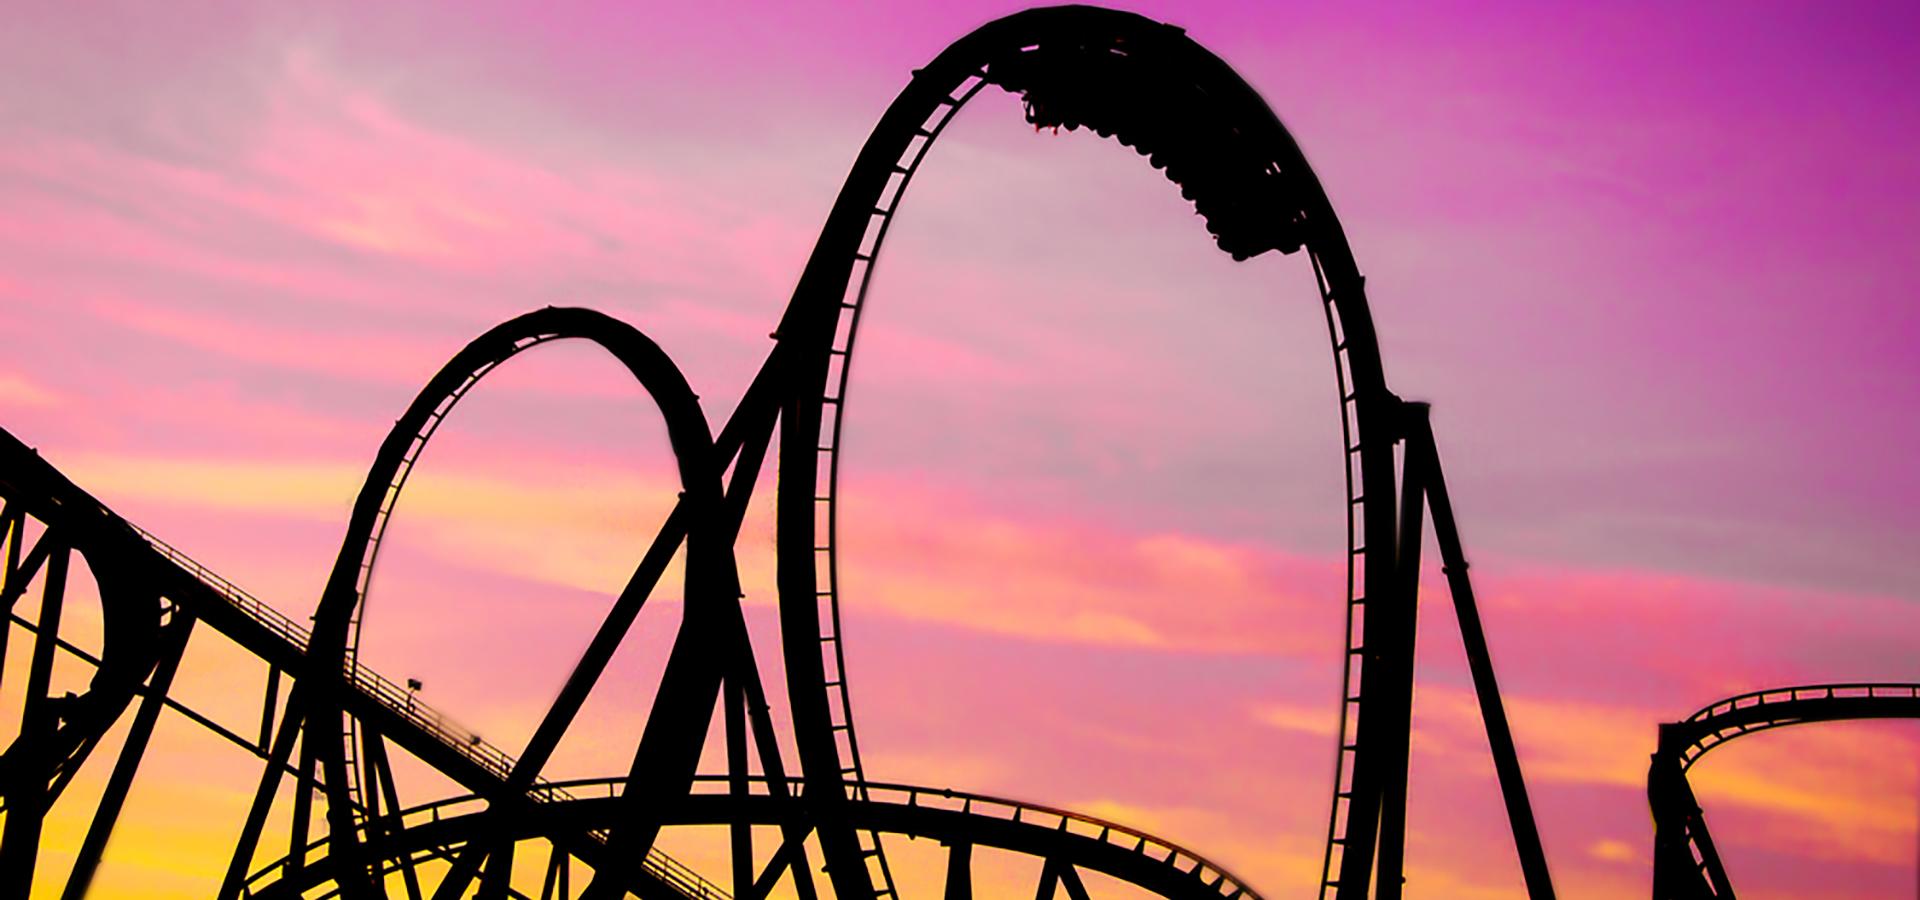 roller-coaster1920x900